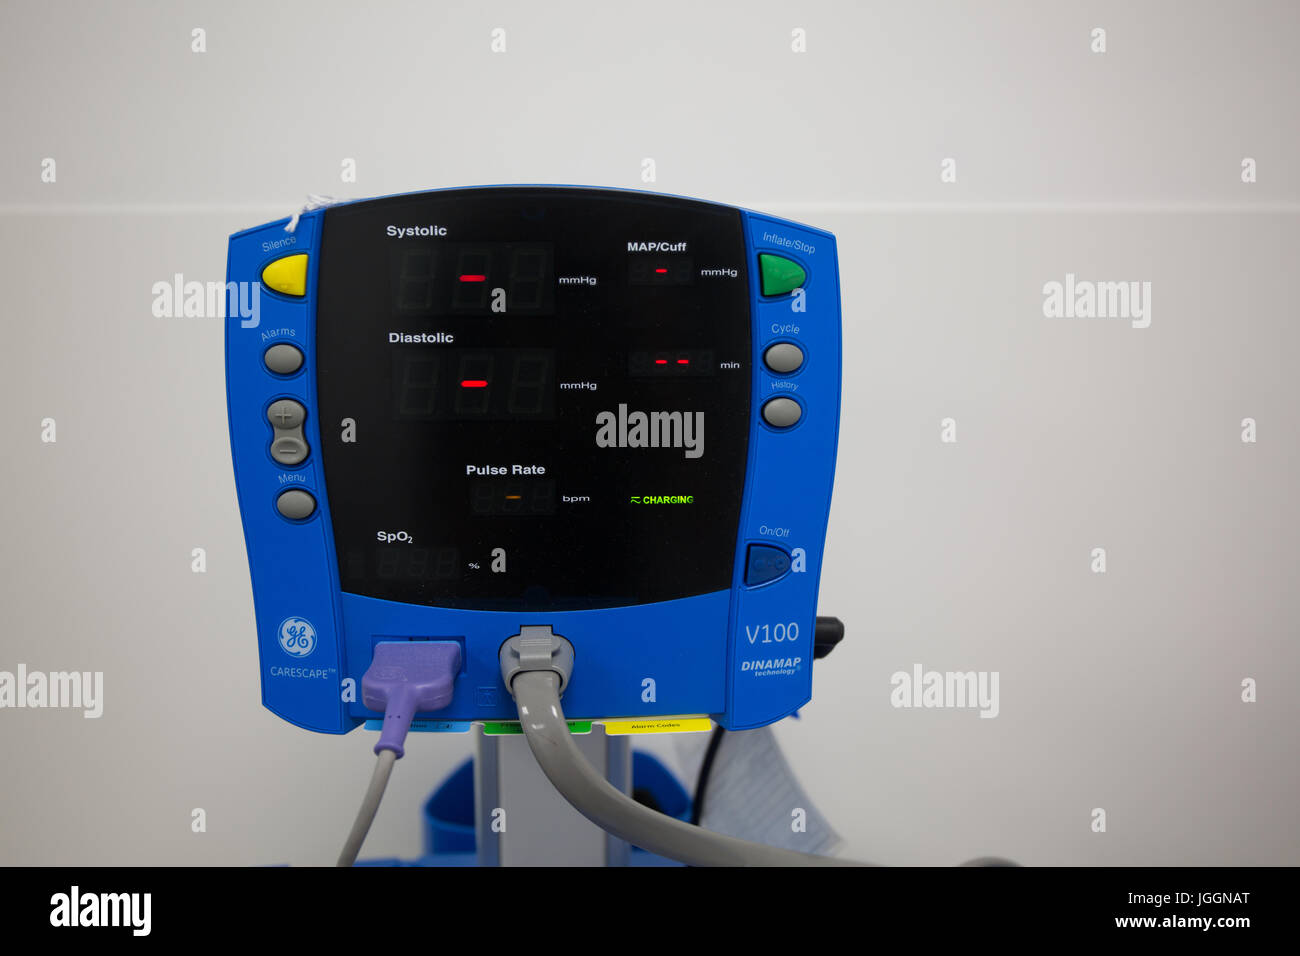 Blood pressure monitor. Stock Photo